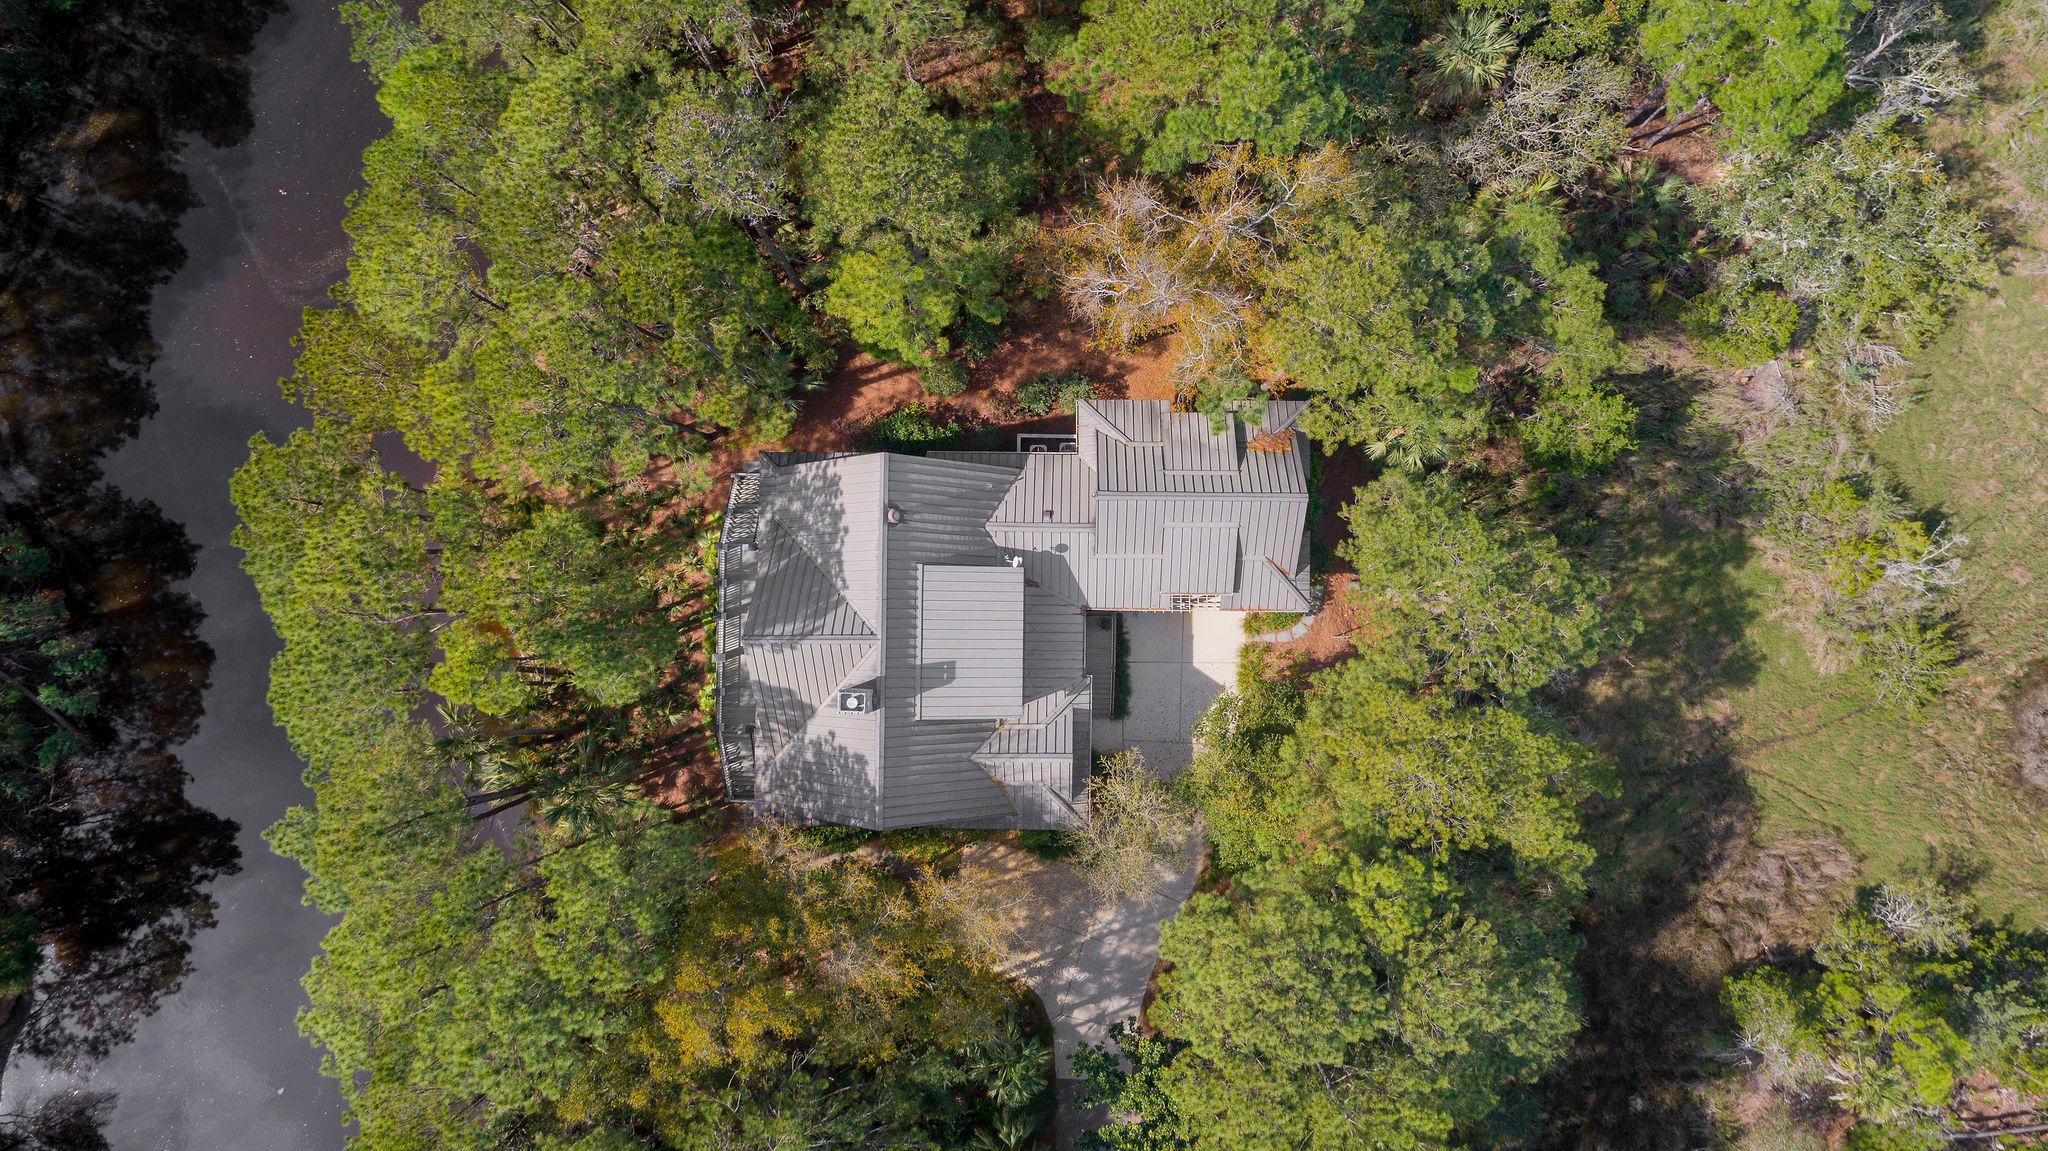 Kiawah Island Homes For Sale - 3 Grey Widgeon, Kiawah Island, SC - 76